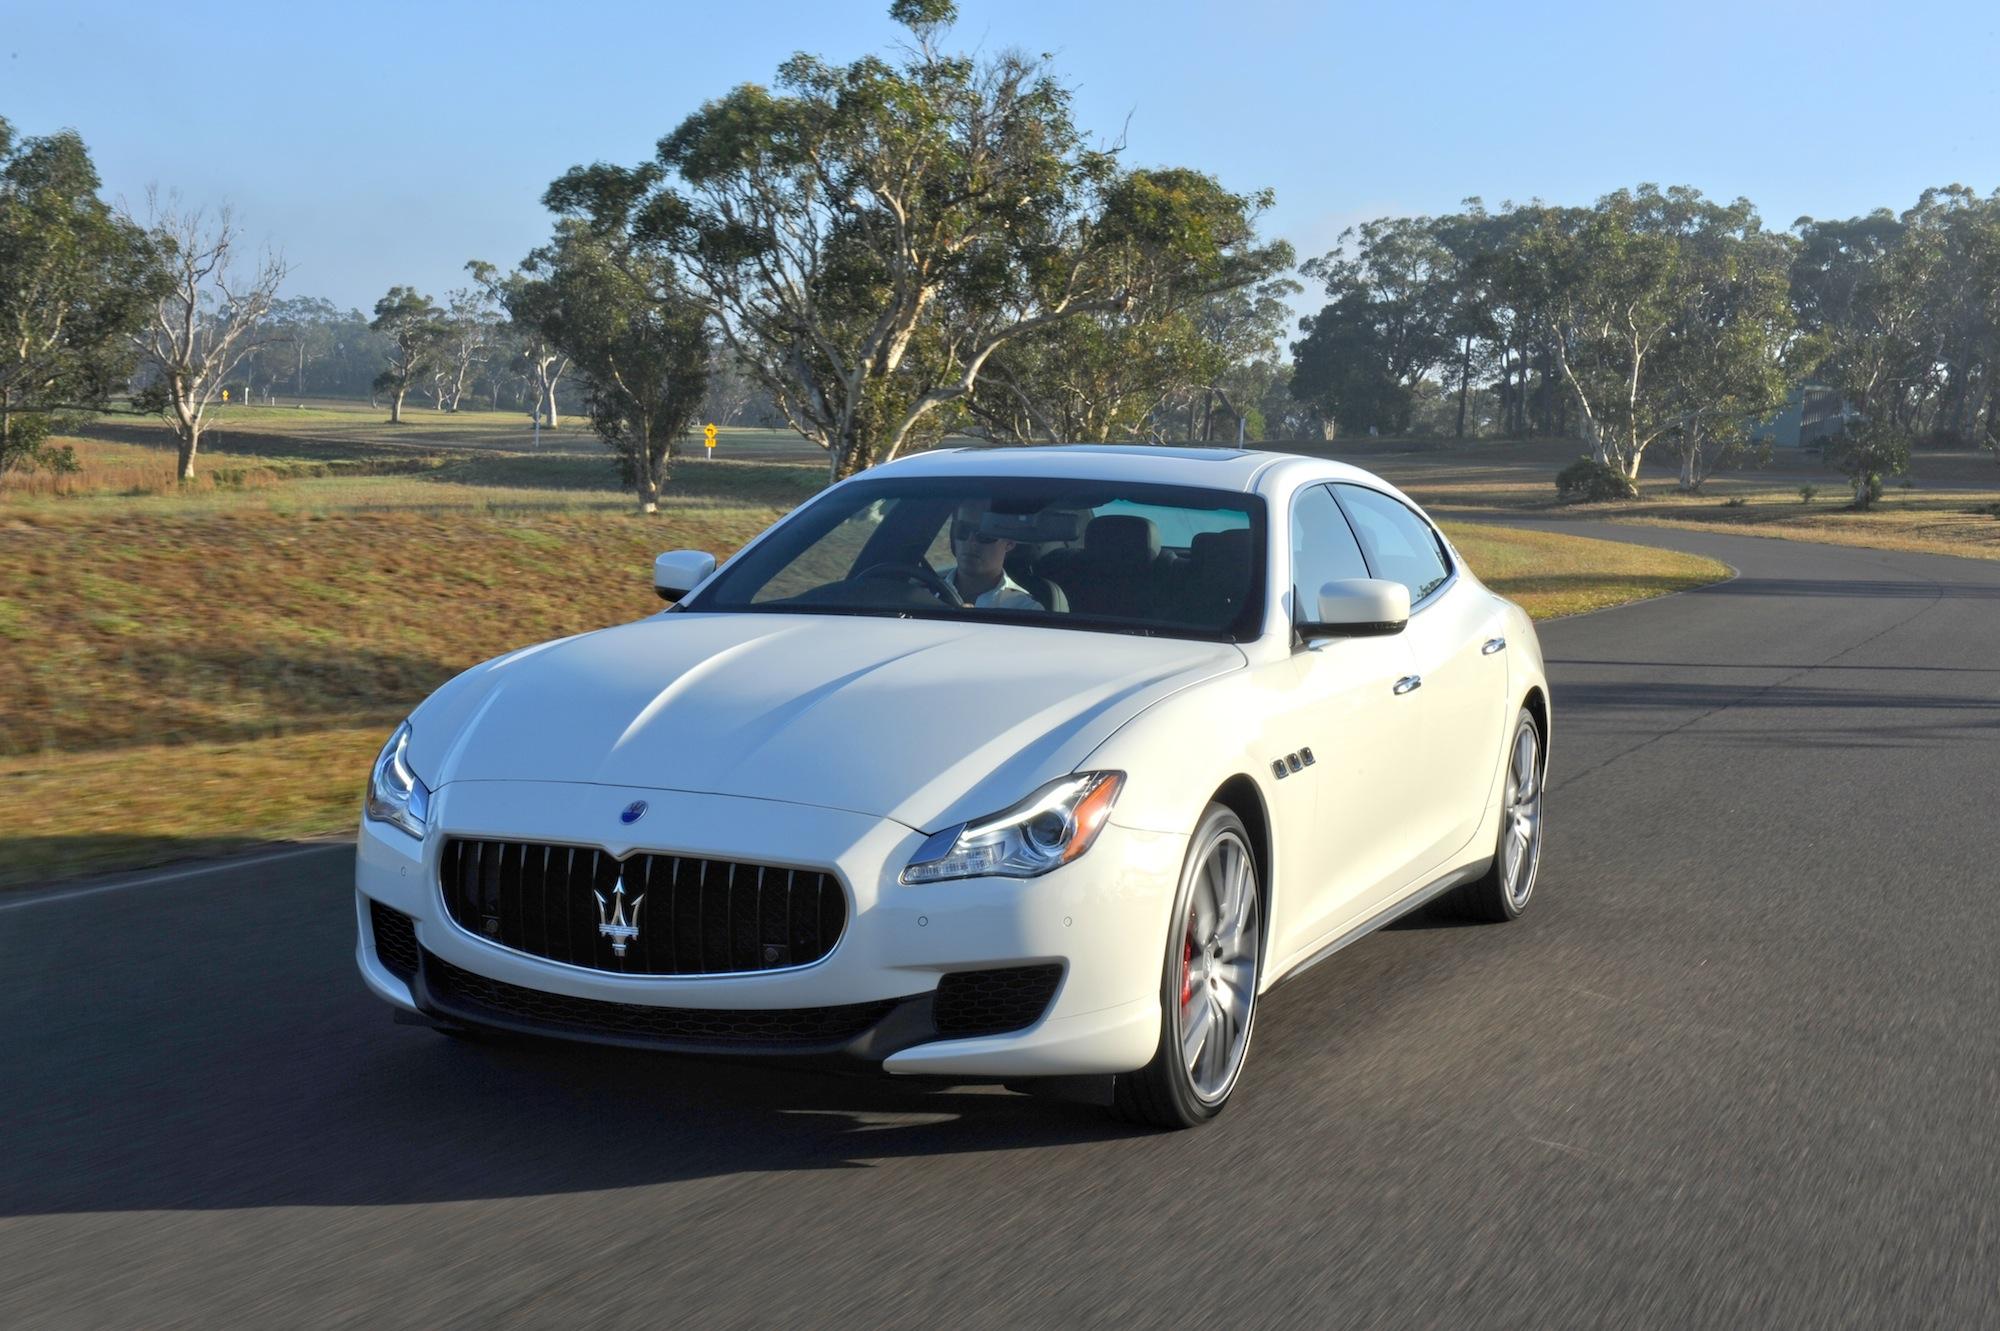 2014 Maserati Quattroporte Review Caradvice